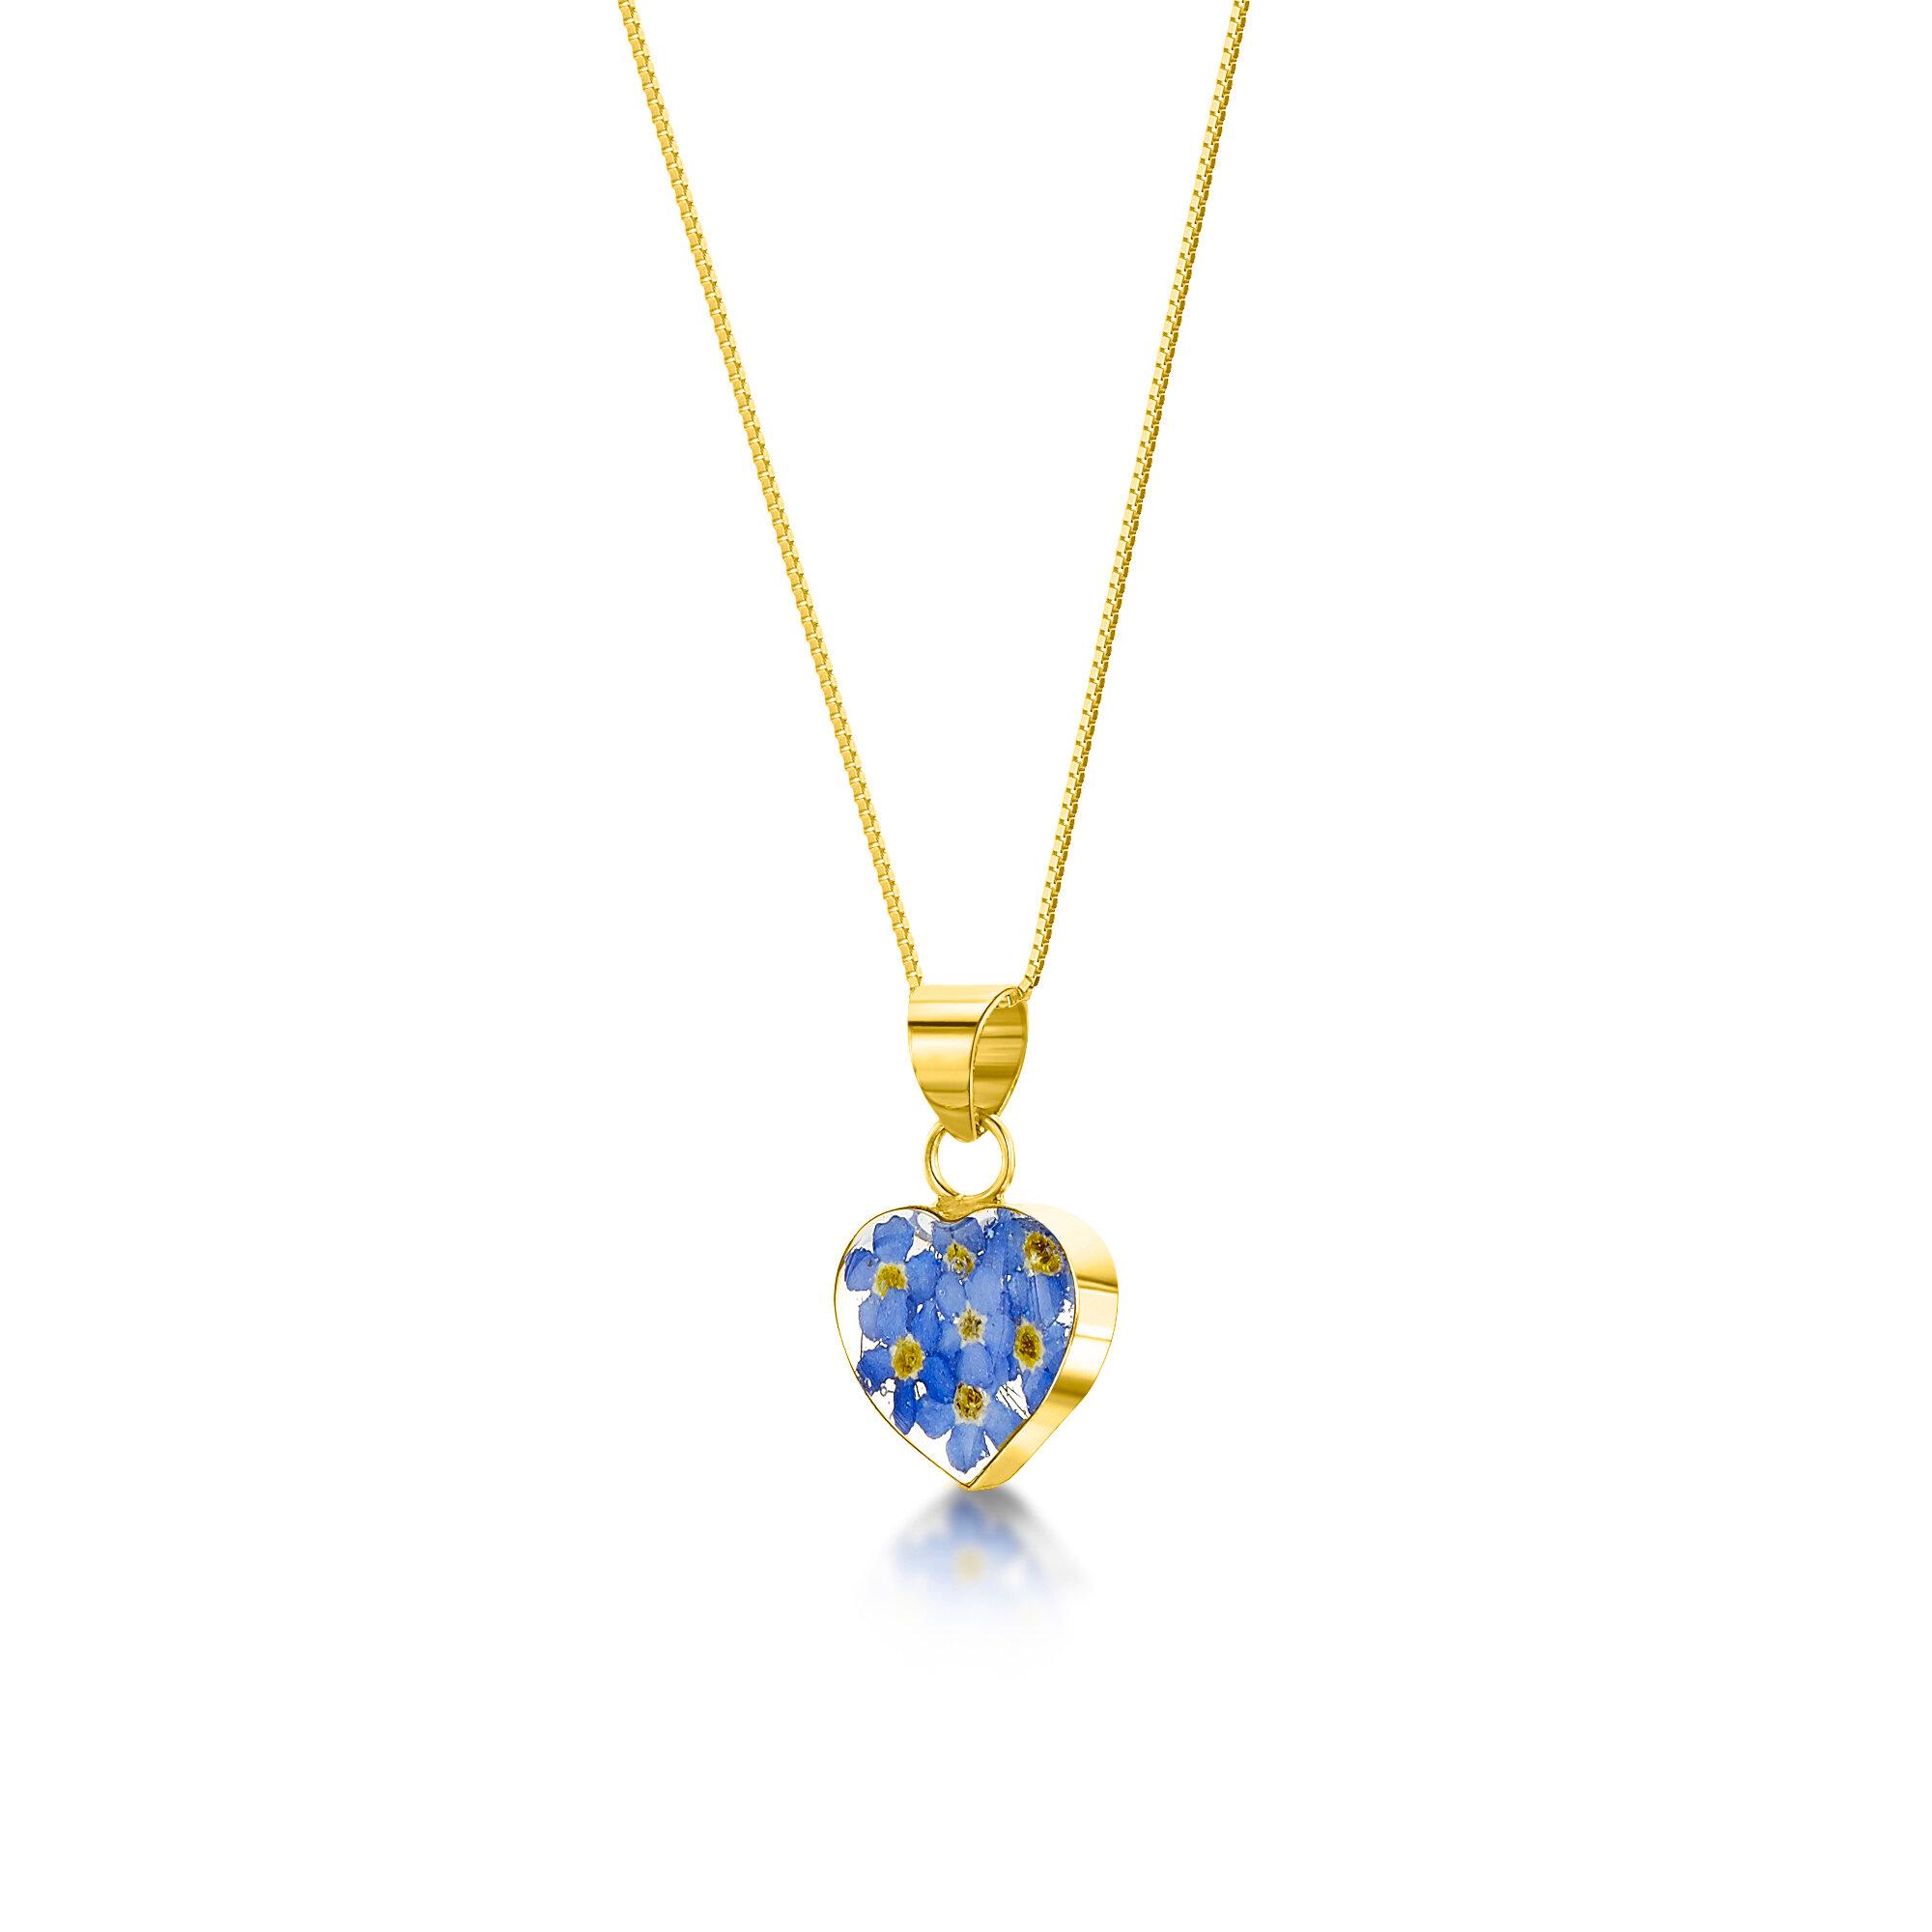 Shrieking Violet Flower Jewellery M A Y B U G S